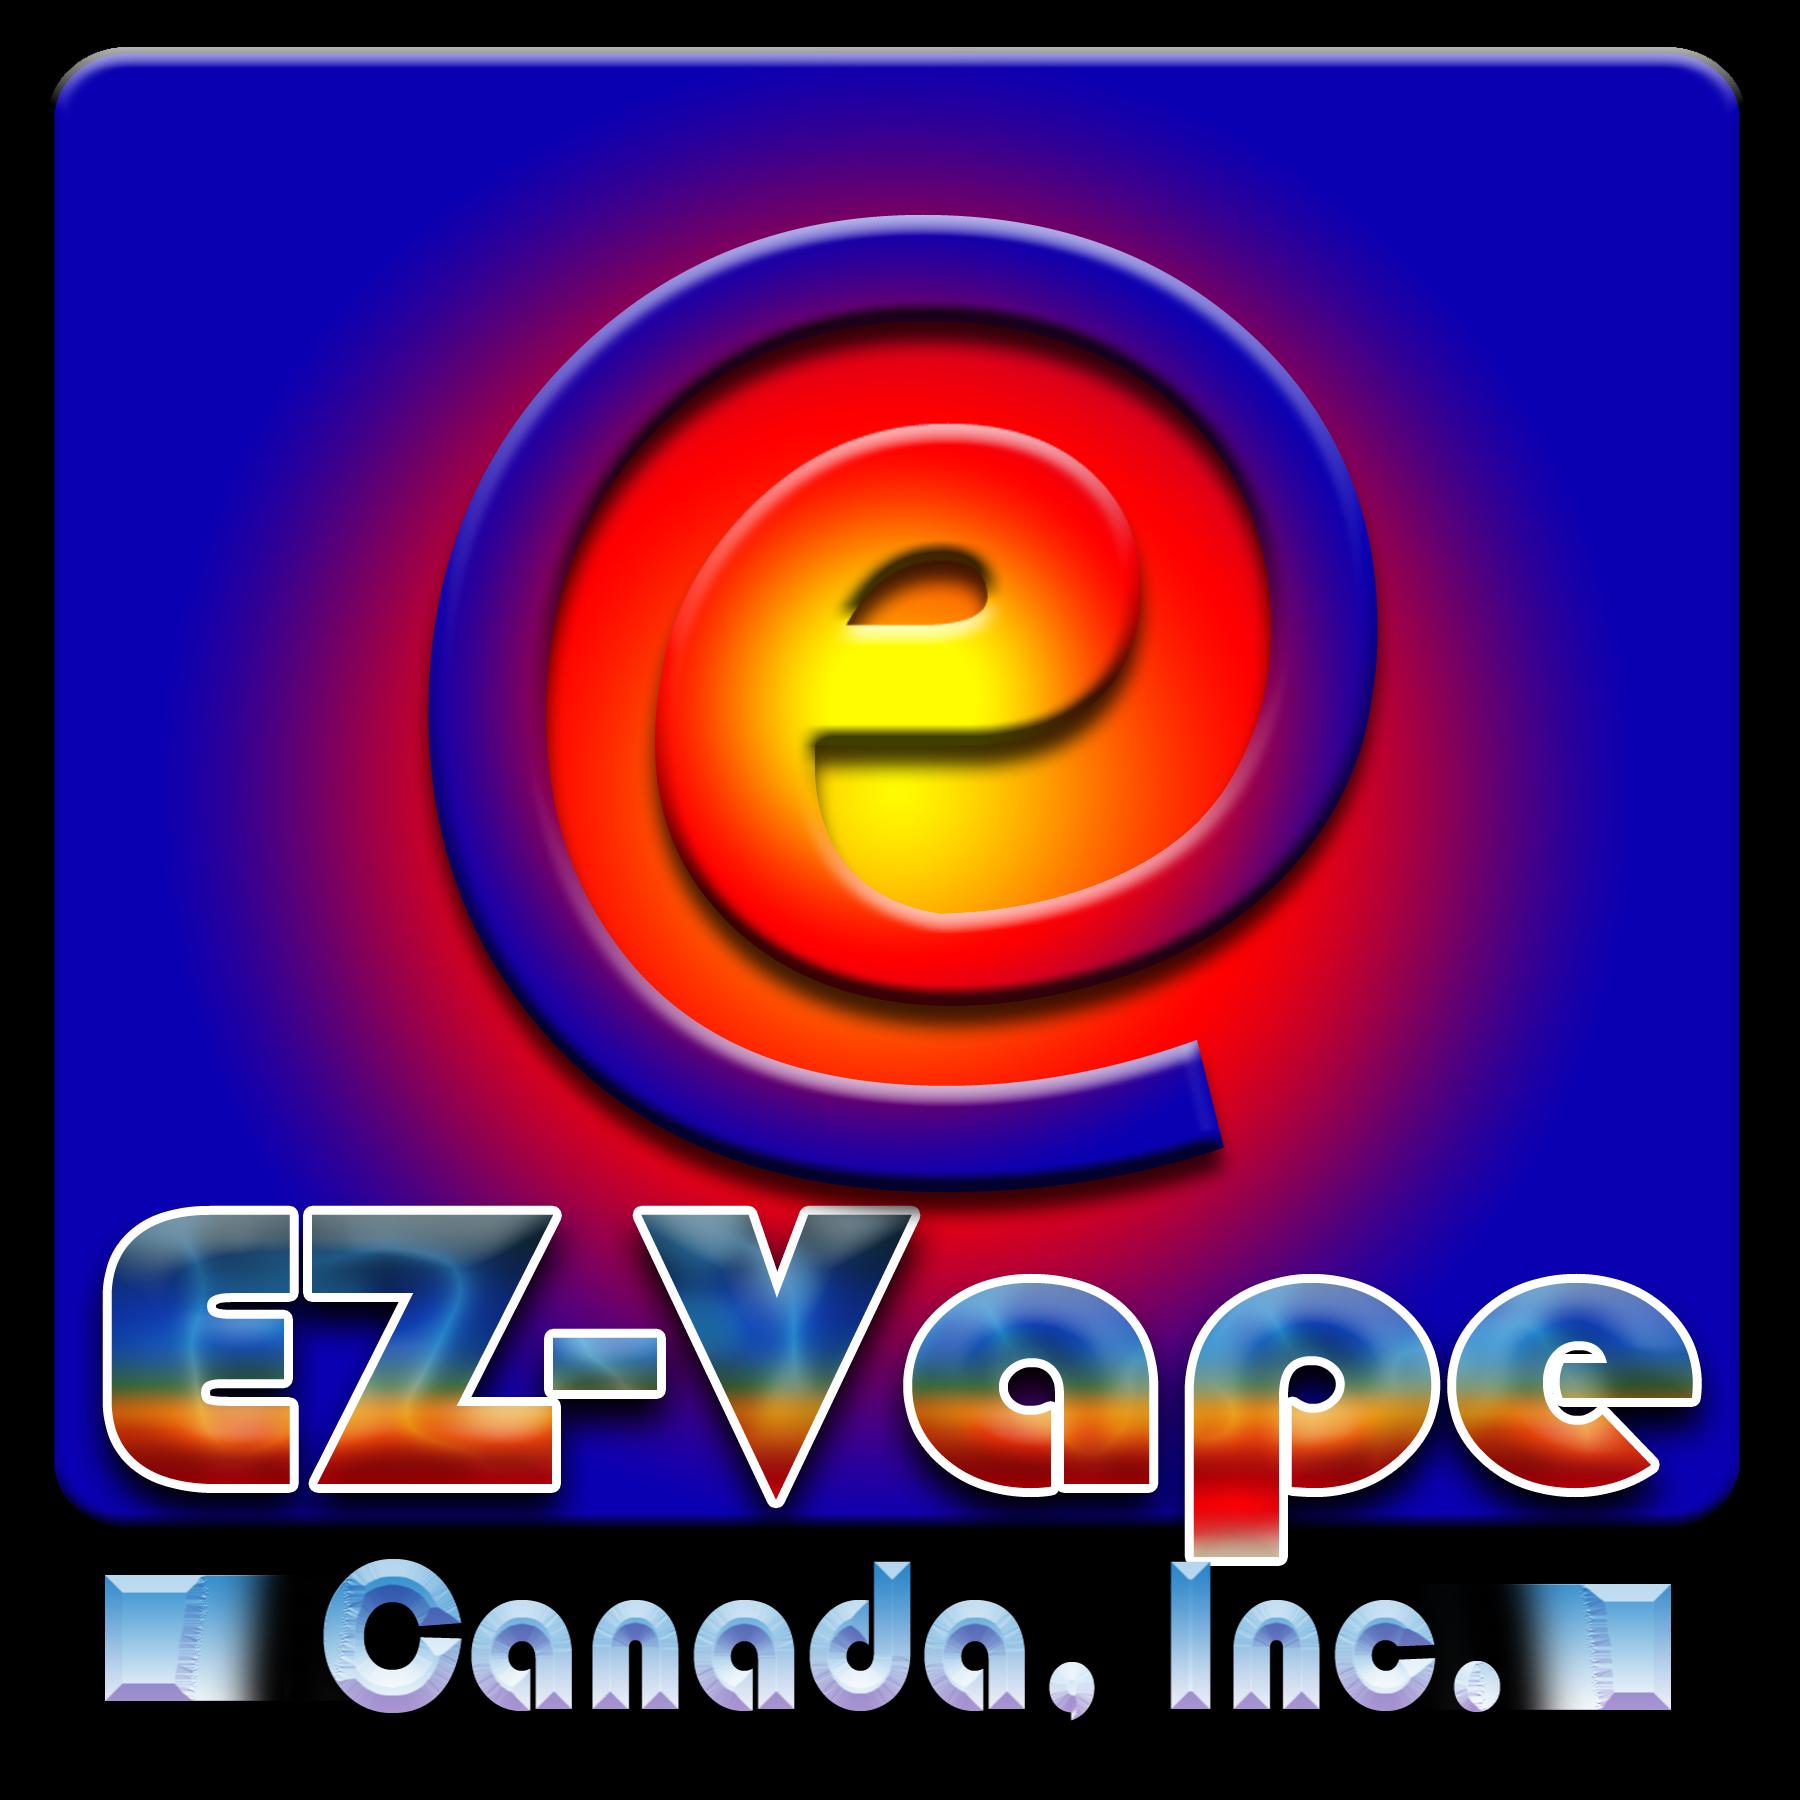 Logo Design by Kitz Malinao - Entry No. 20 in the Logo Design Contest Inspiring Logo Design for EZ-Vape Canada Inc.